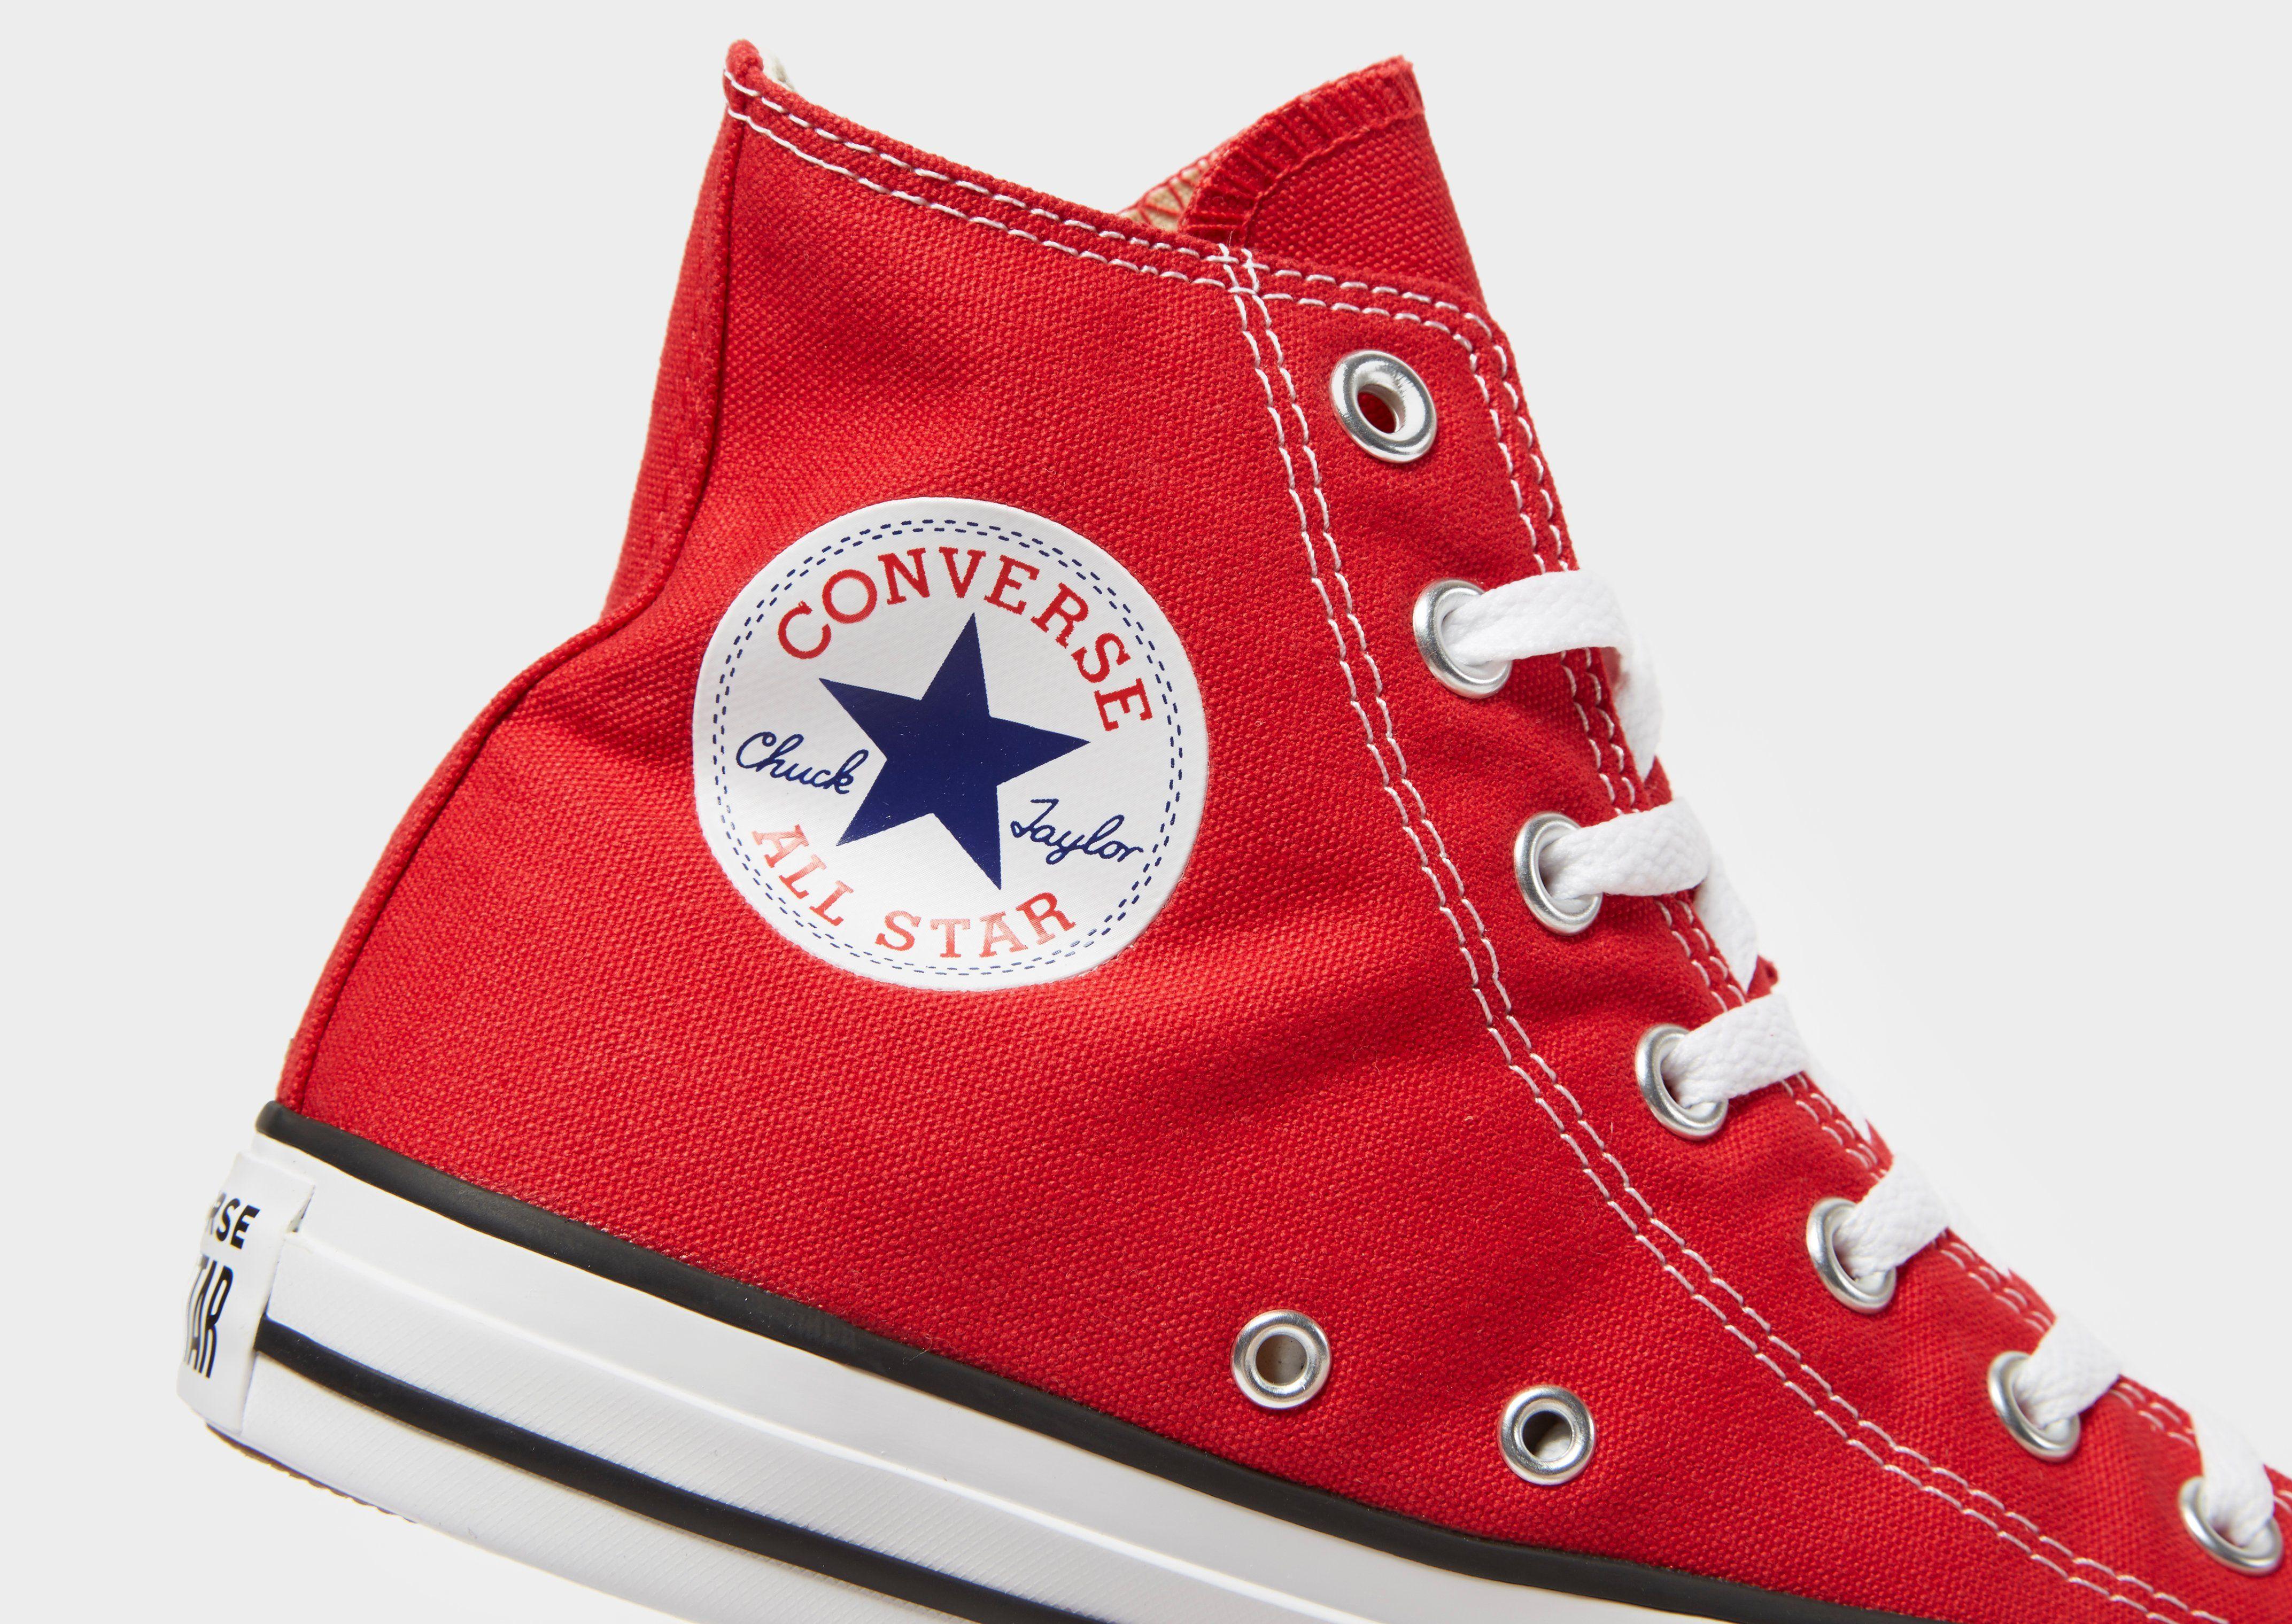 Converse All Star Hi Women's